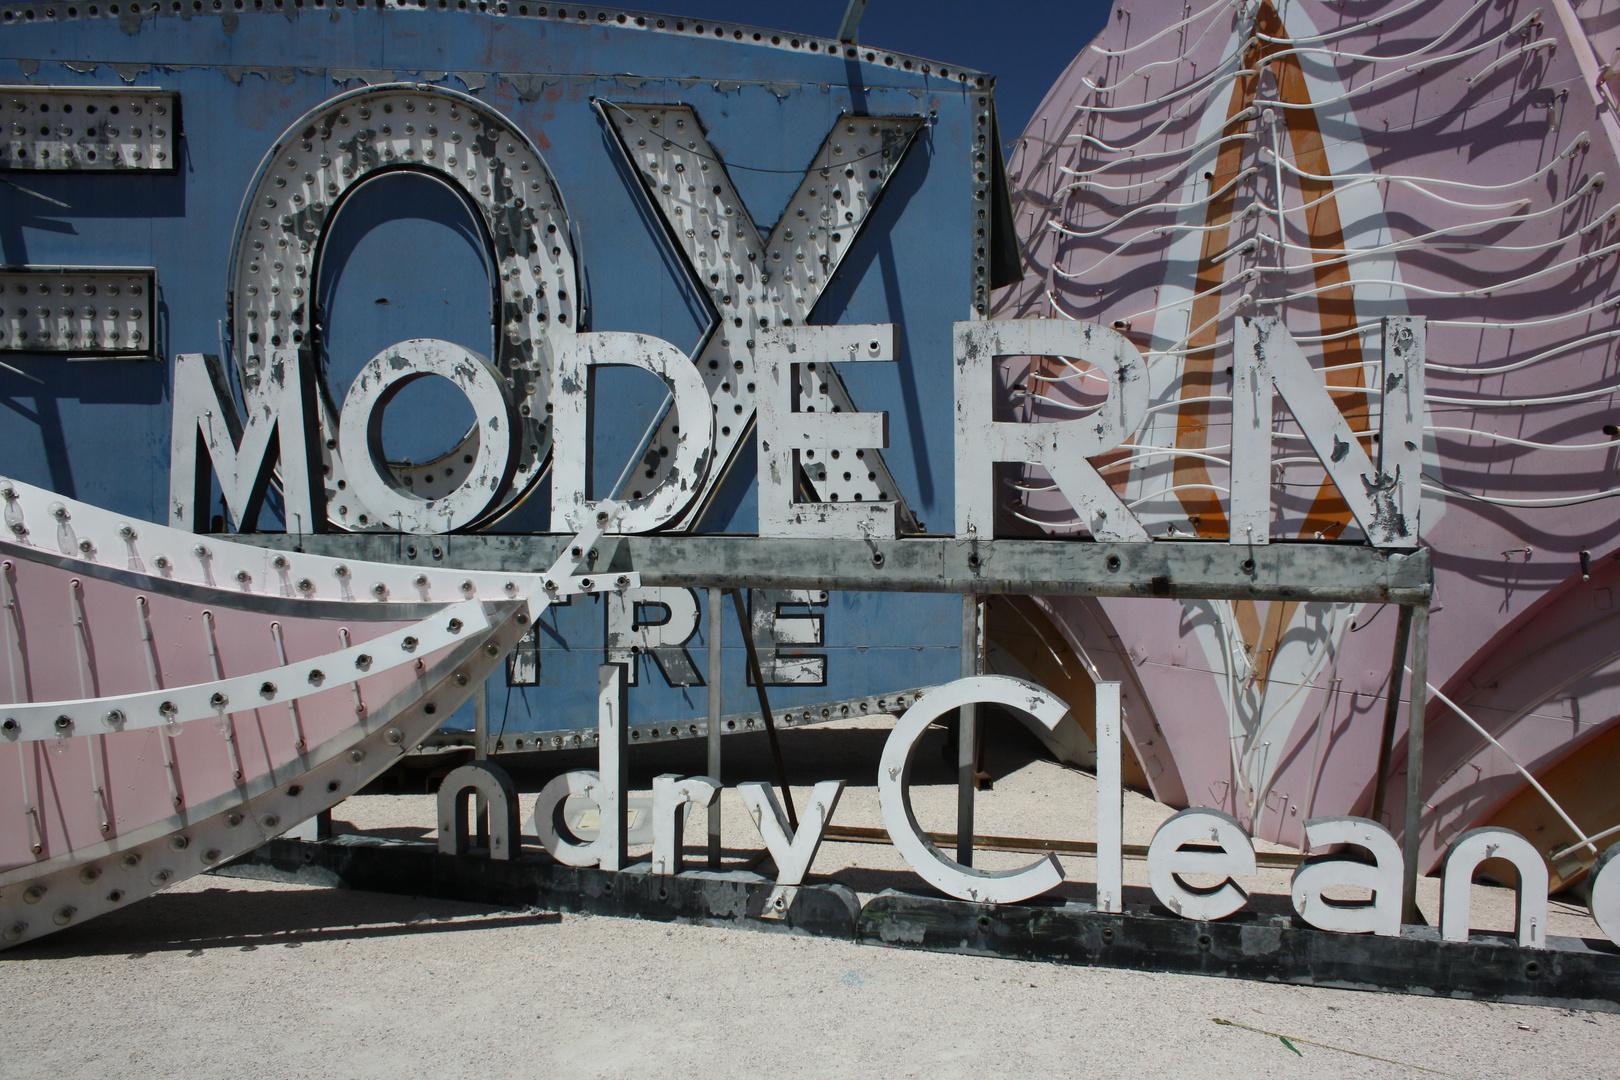 Neon sign boneyard